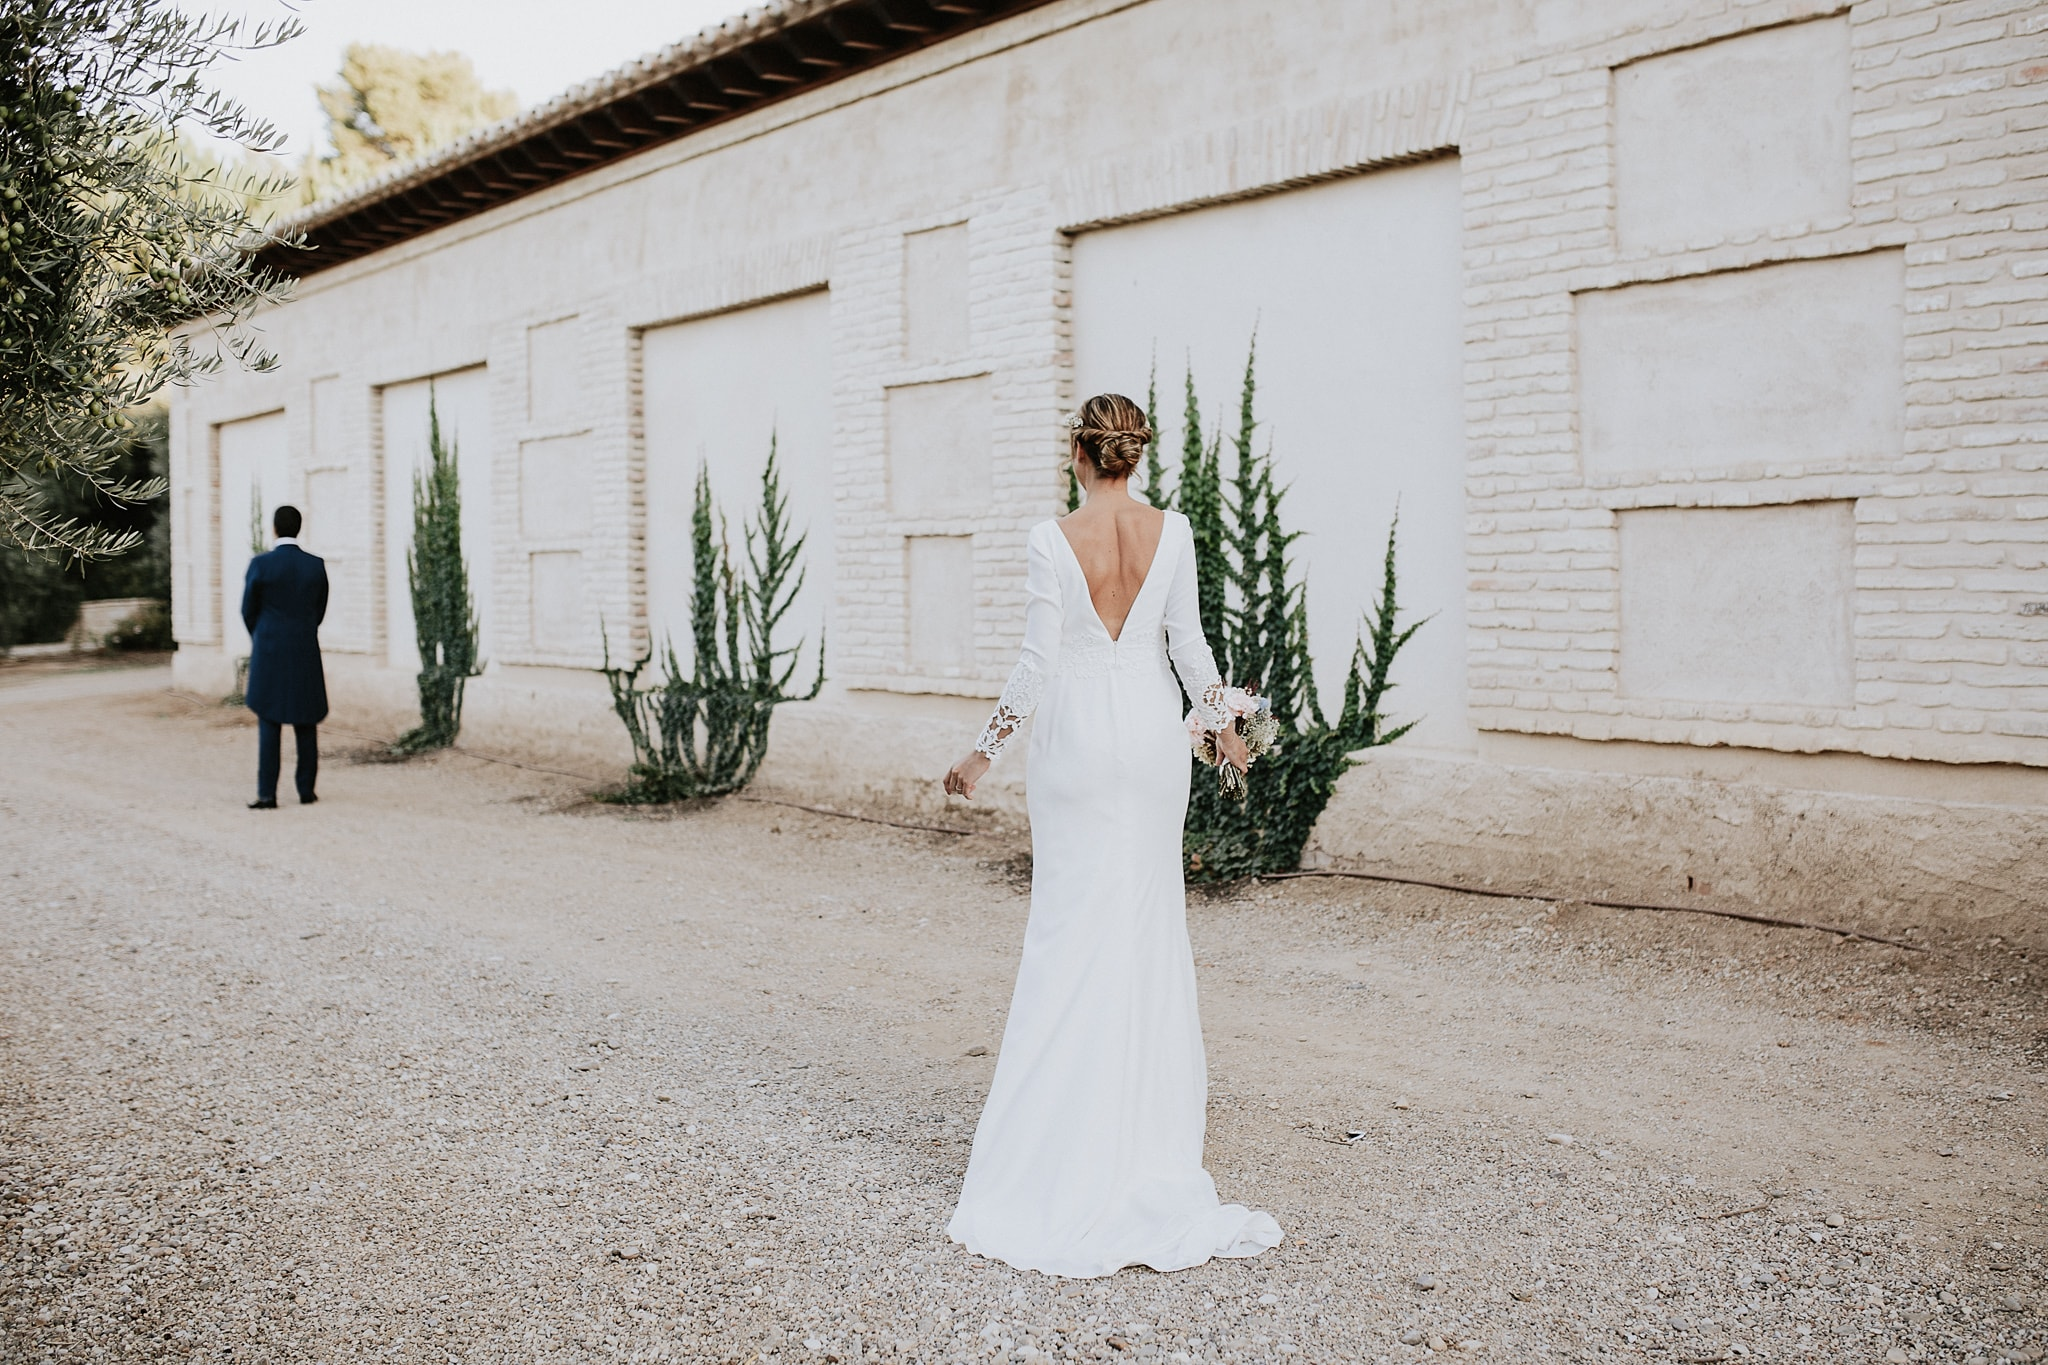 prisma-blanco-fotografos-bodas-toledo-60